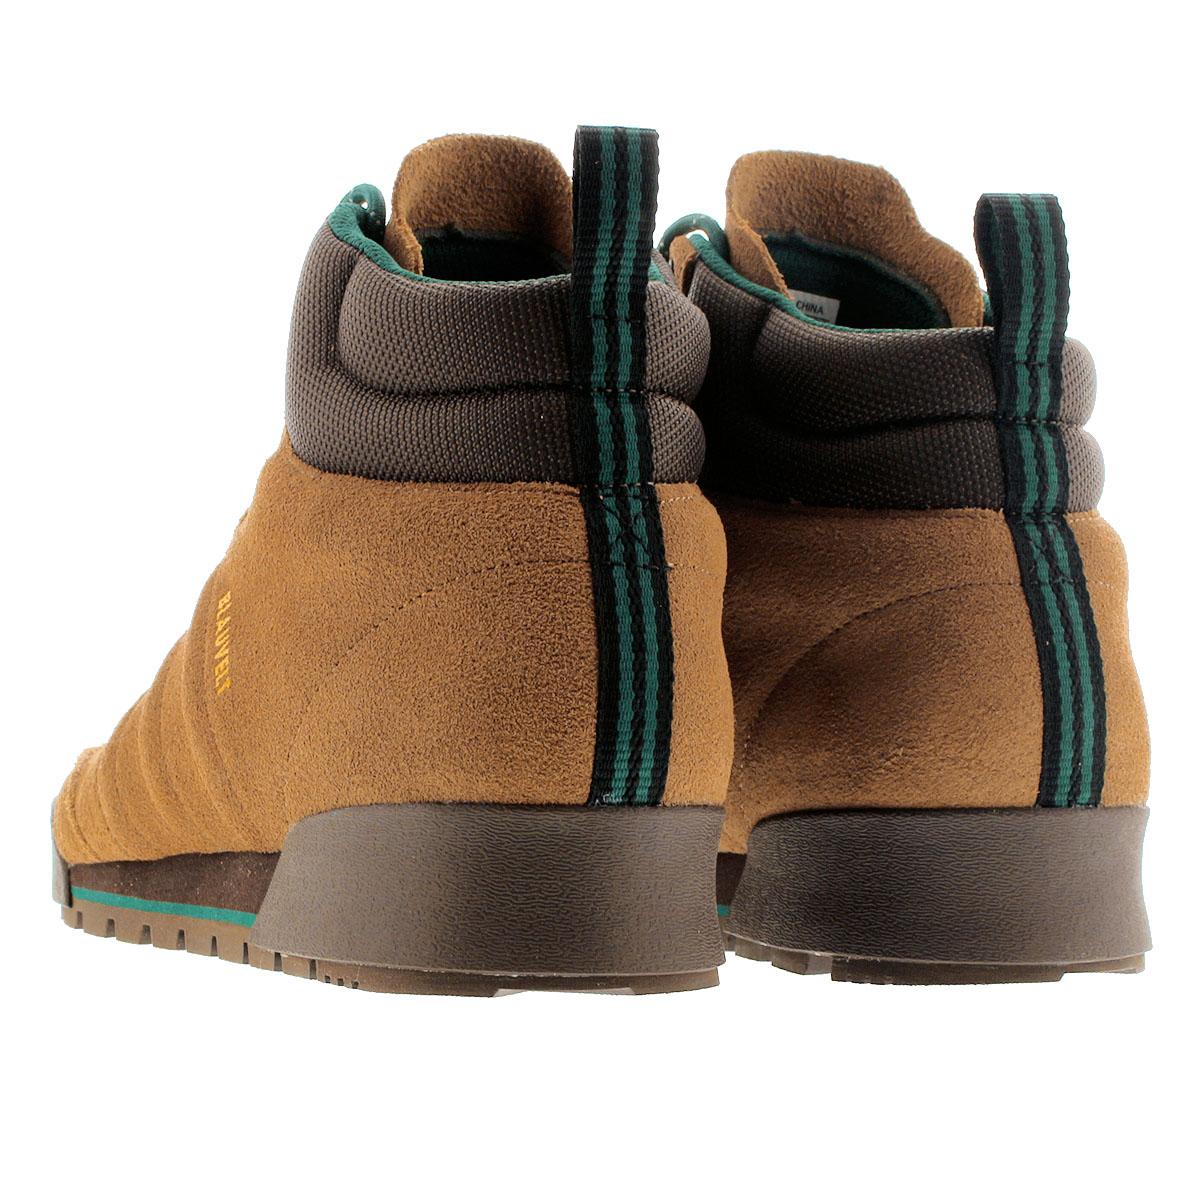 adidas jake boot 2.0 beige